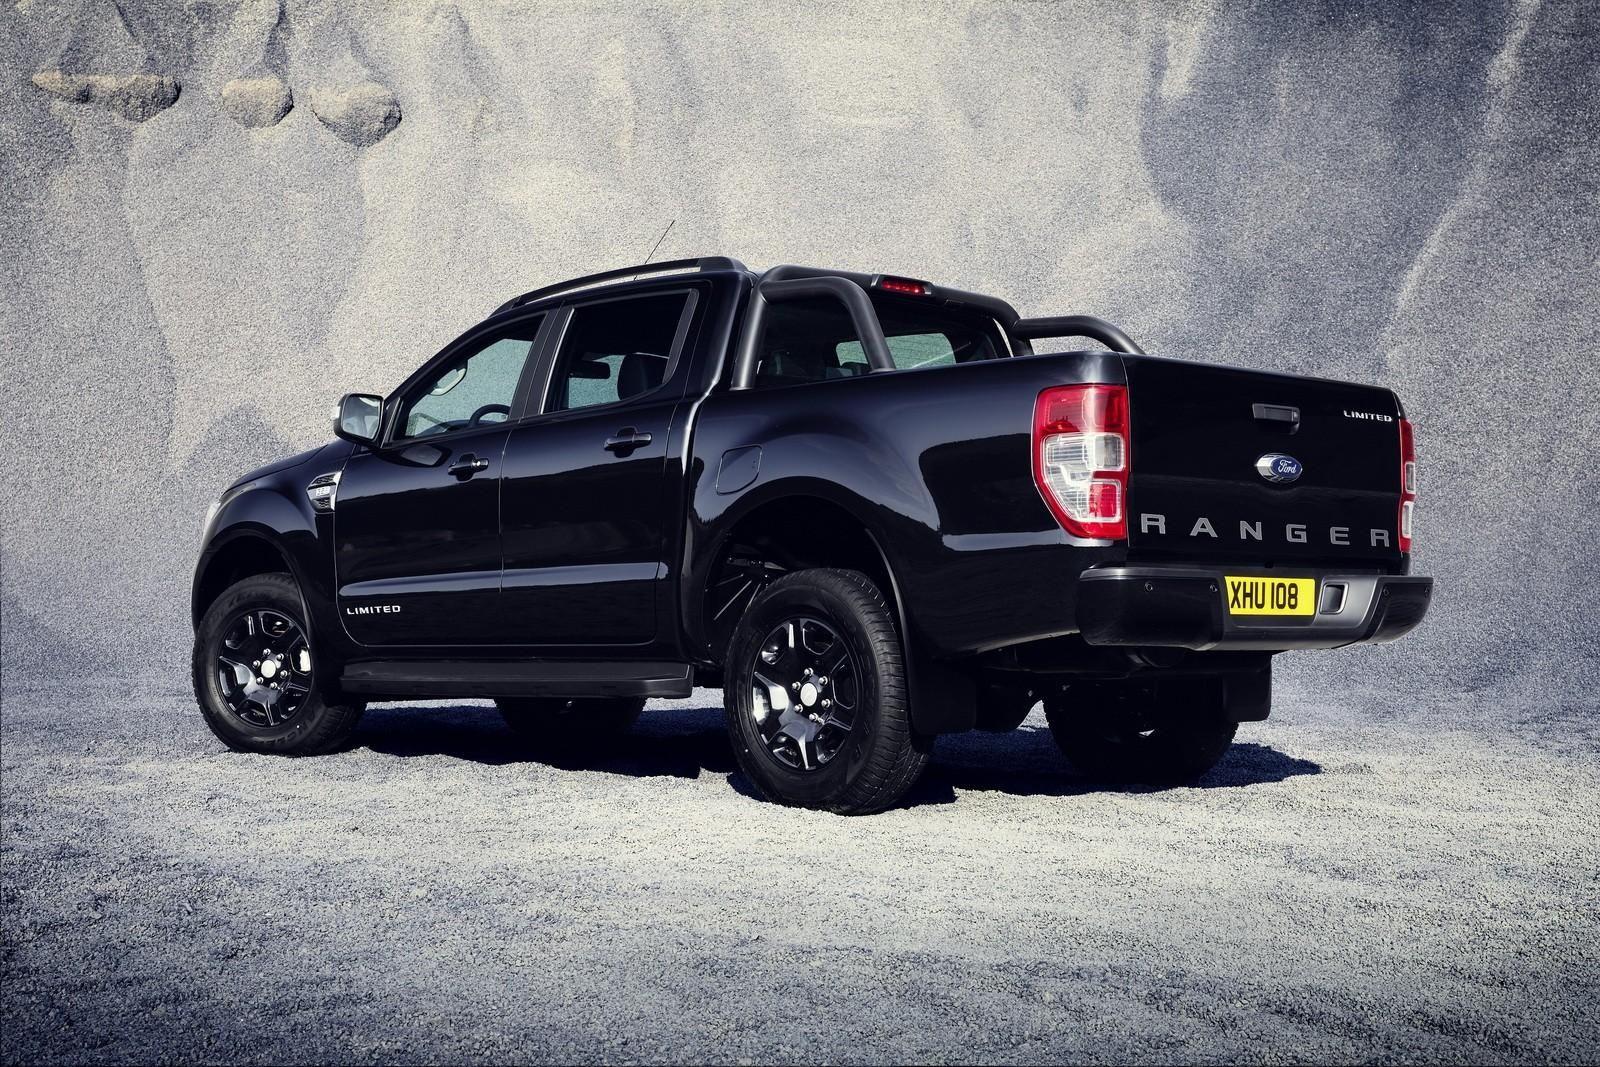 2018 Ford Ranger Black Edition Limited To 2 500 Units Autoevolution Regarding Photos